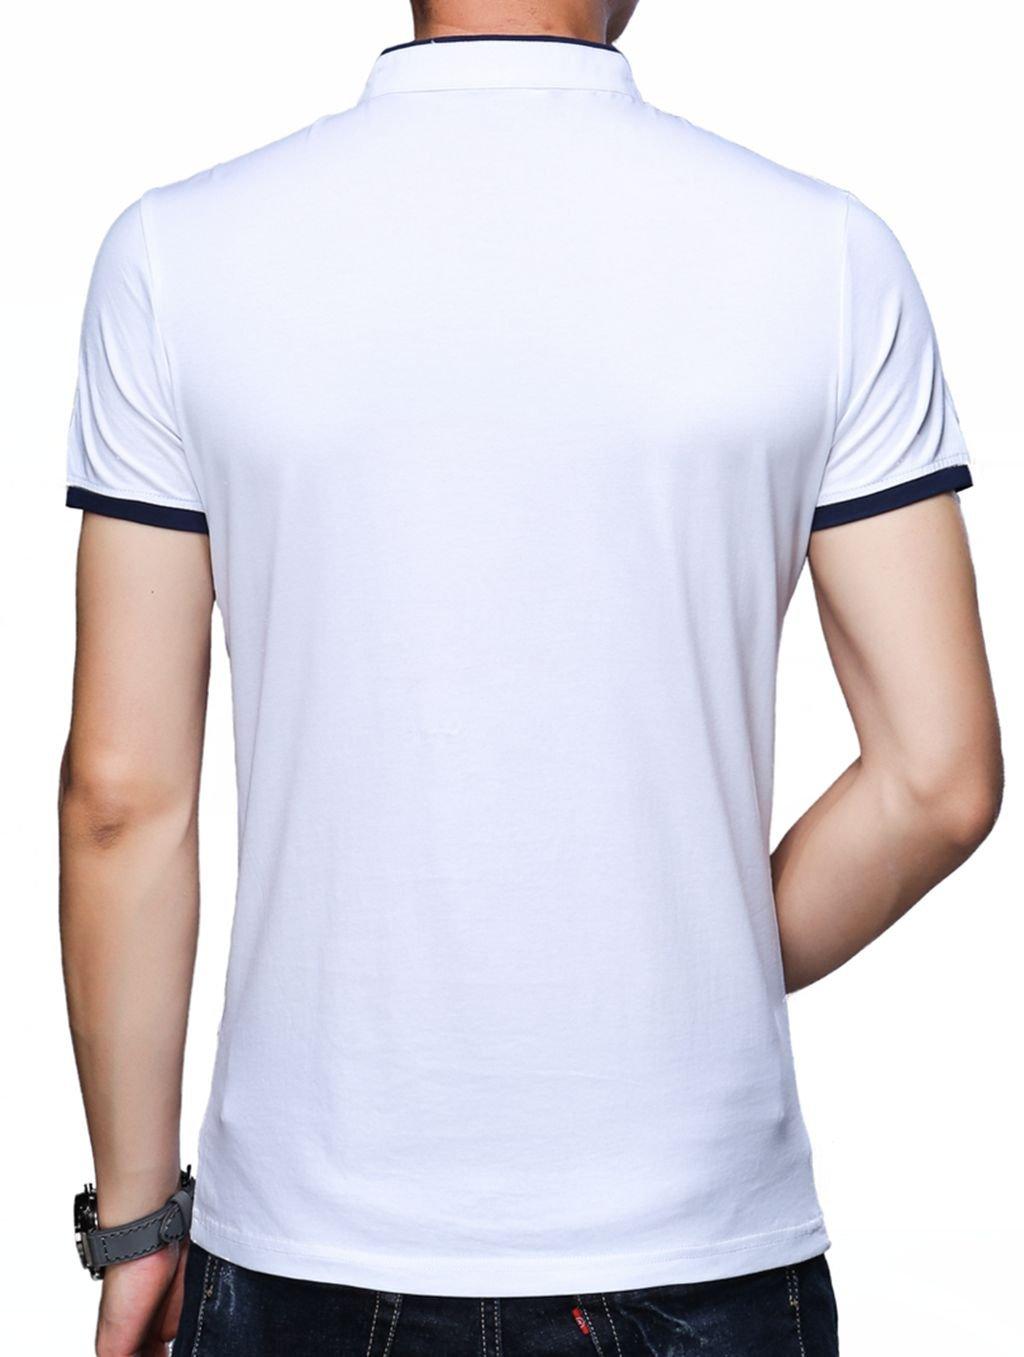 0e93b7634c15 KUYIGO Men's Casual Slim Fit Short Sleeve Henley T-Shirts Cotton Shirts by  KUYIGO (